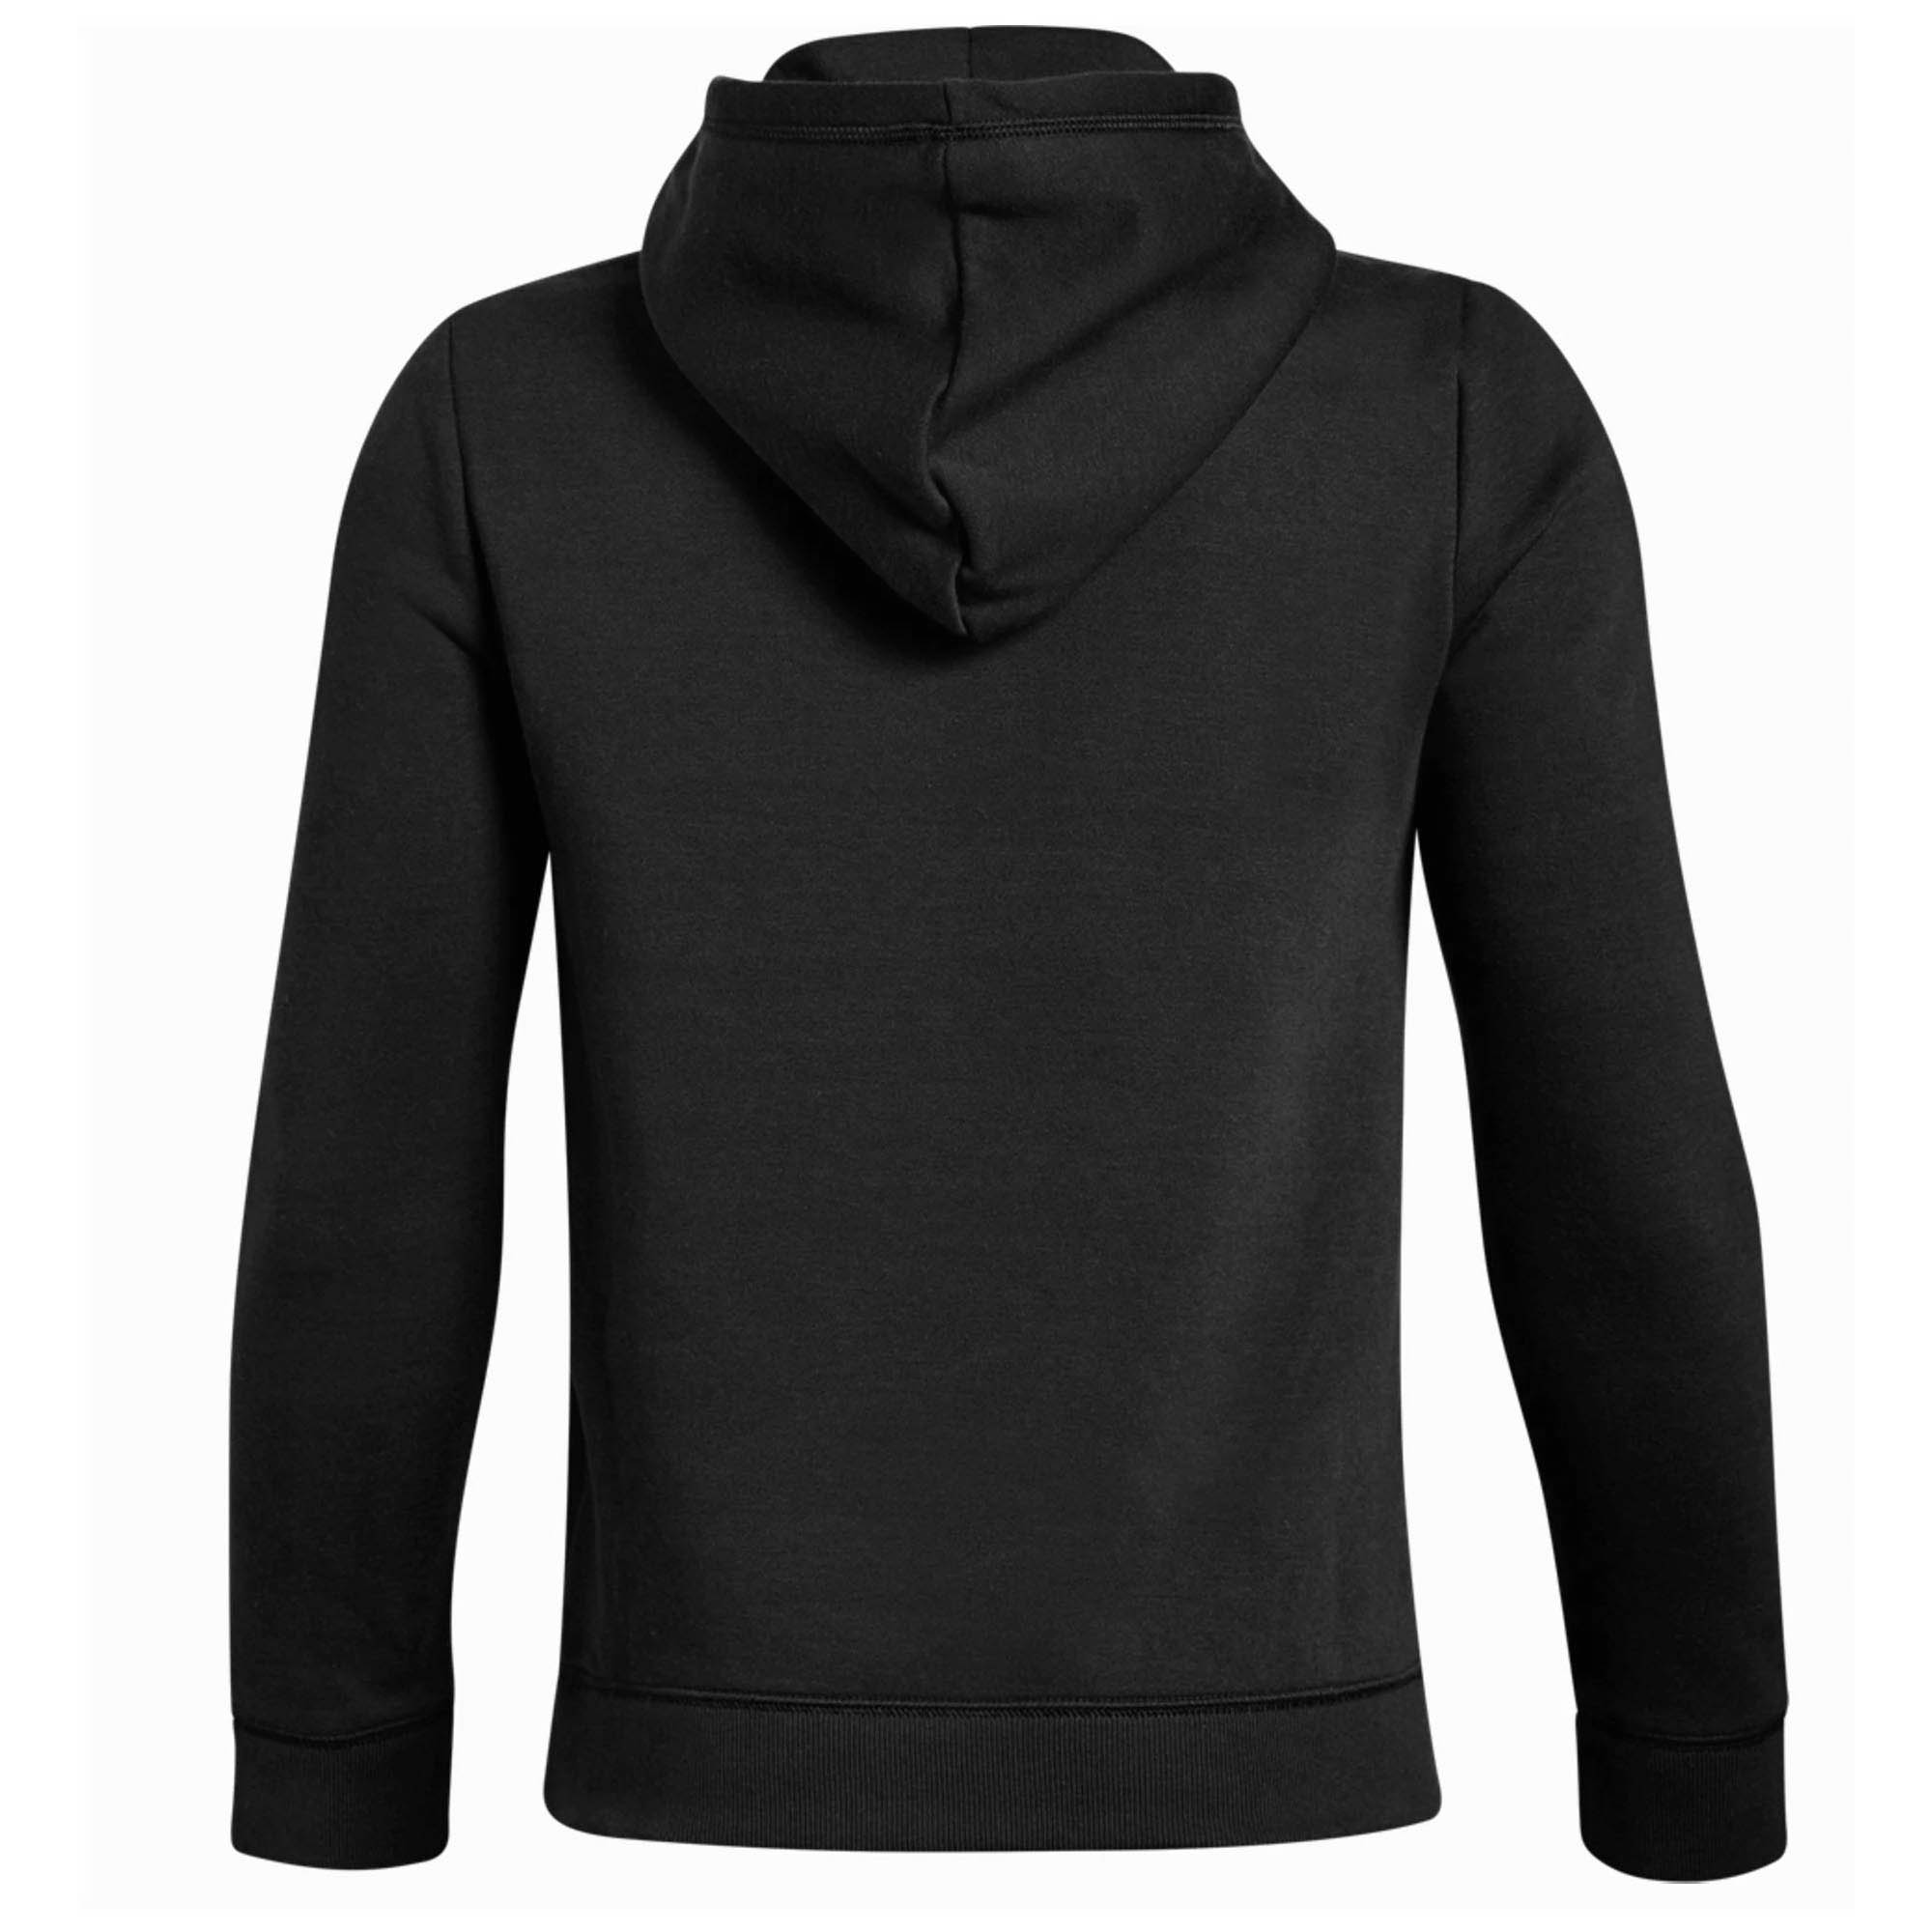 c5e2f2513eba Details about Under Armour Cotton Fleece Over Head Kids Hoodie Hoody Jacket  Black